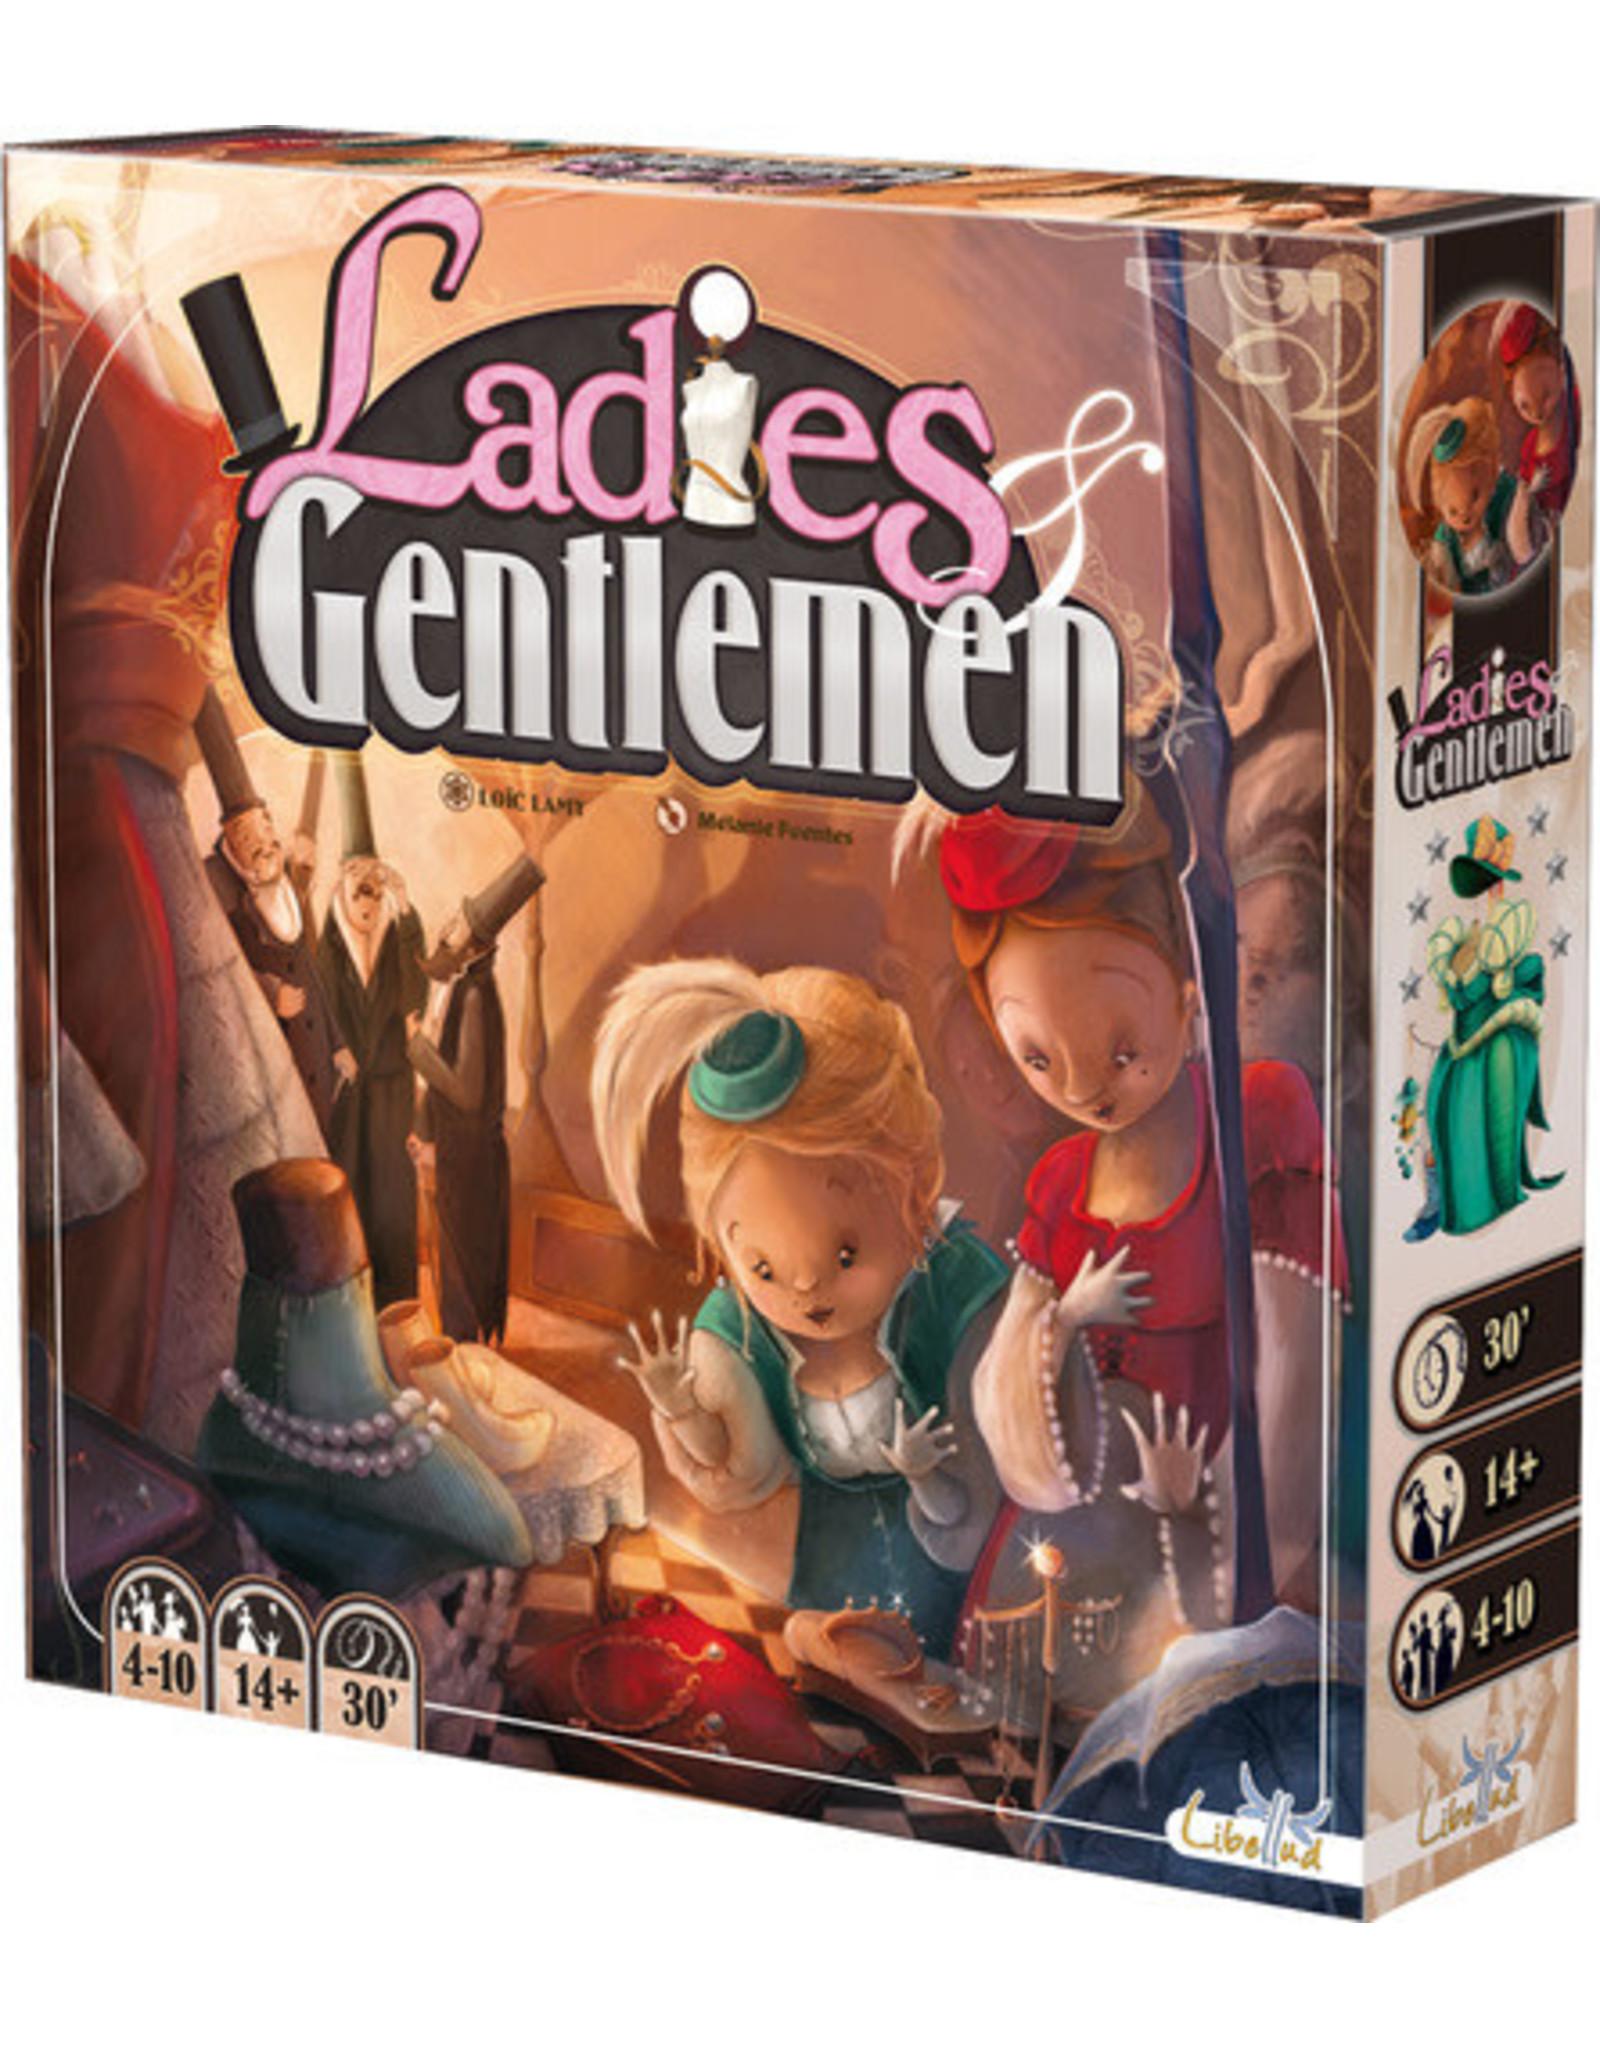 Ladies & Gentlemen Board Game